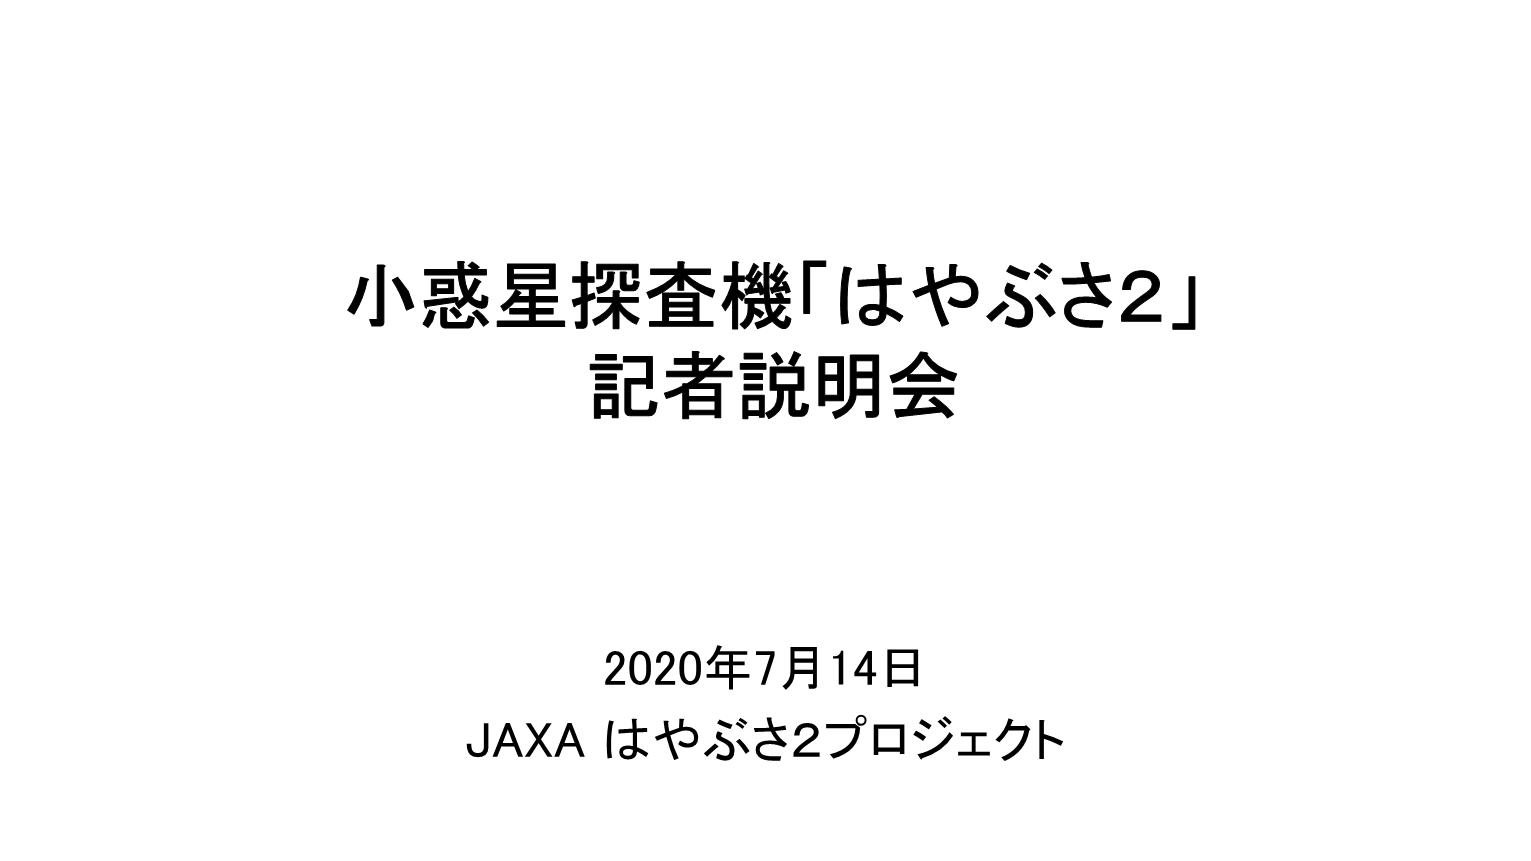 f:id:Imamura:20200714230212p:plain